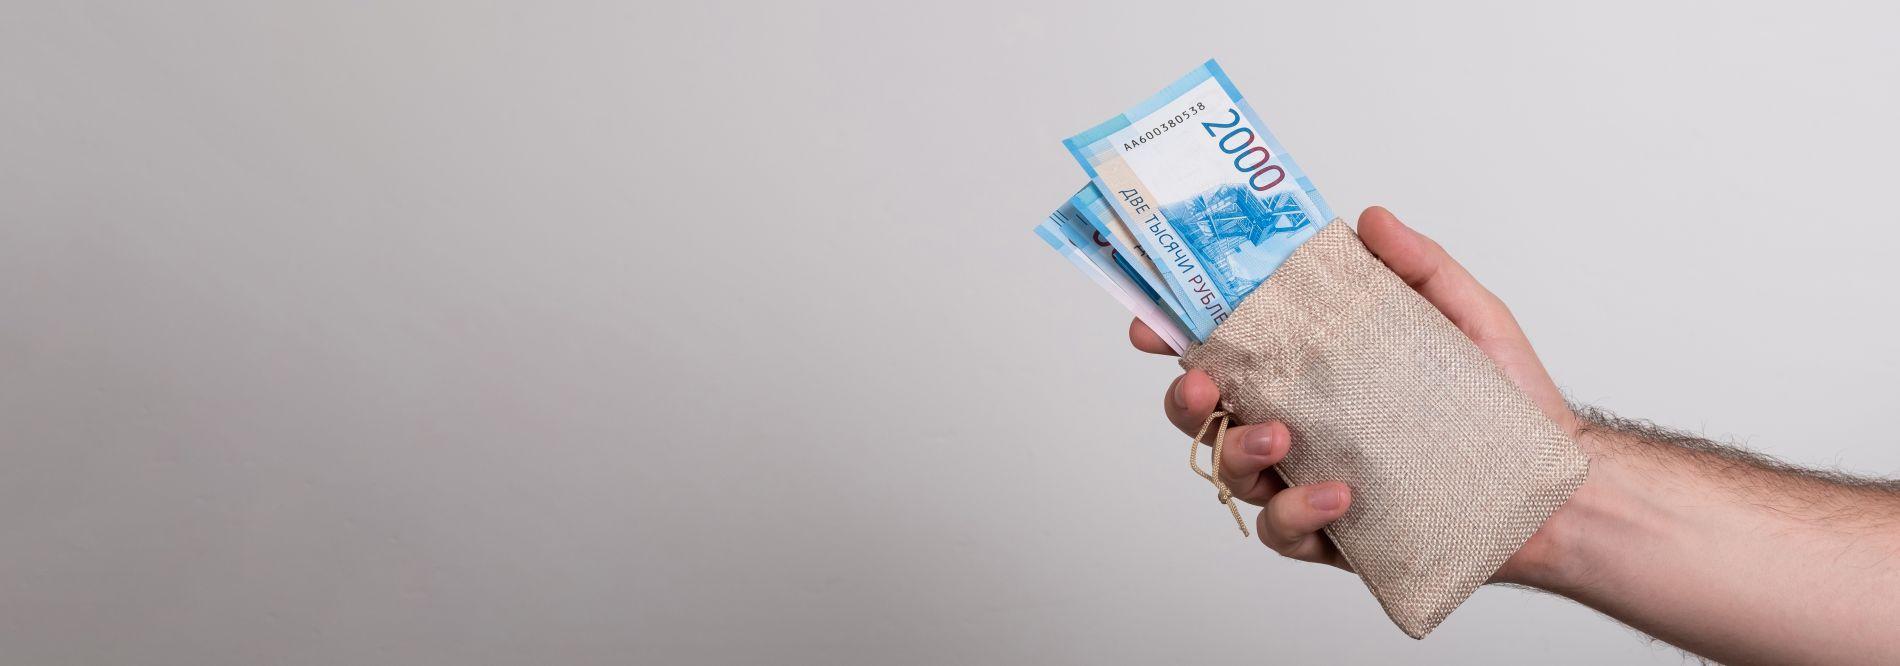 Займ без предоплаты без справок